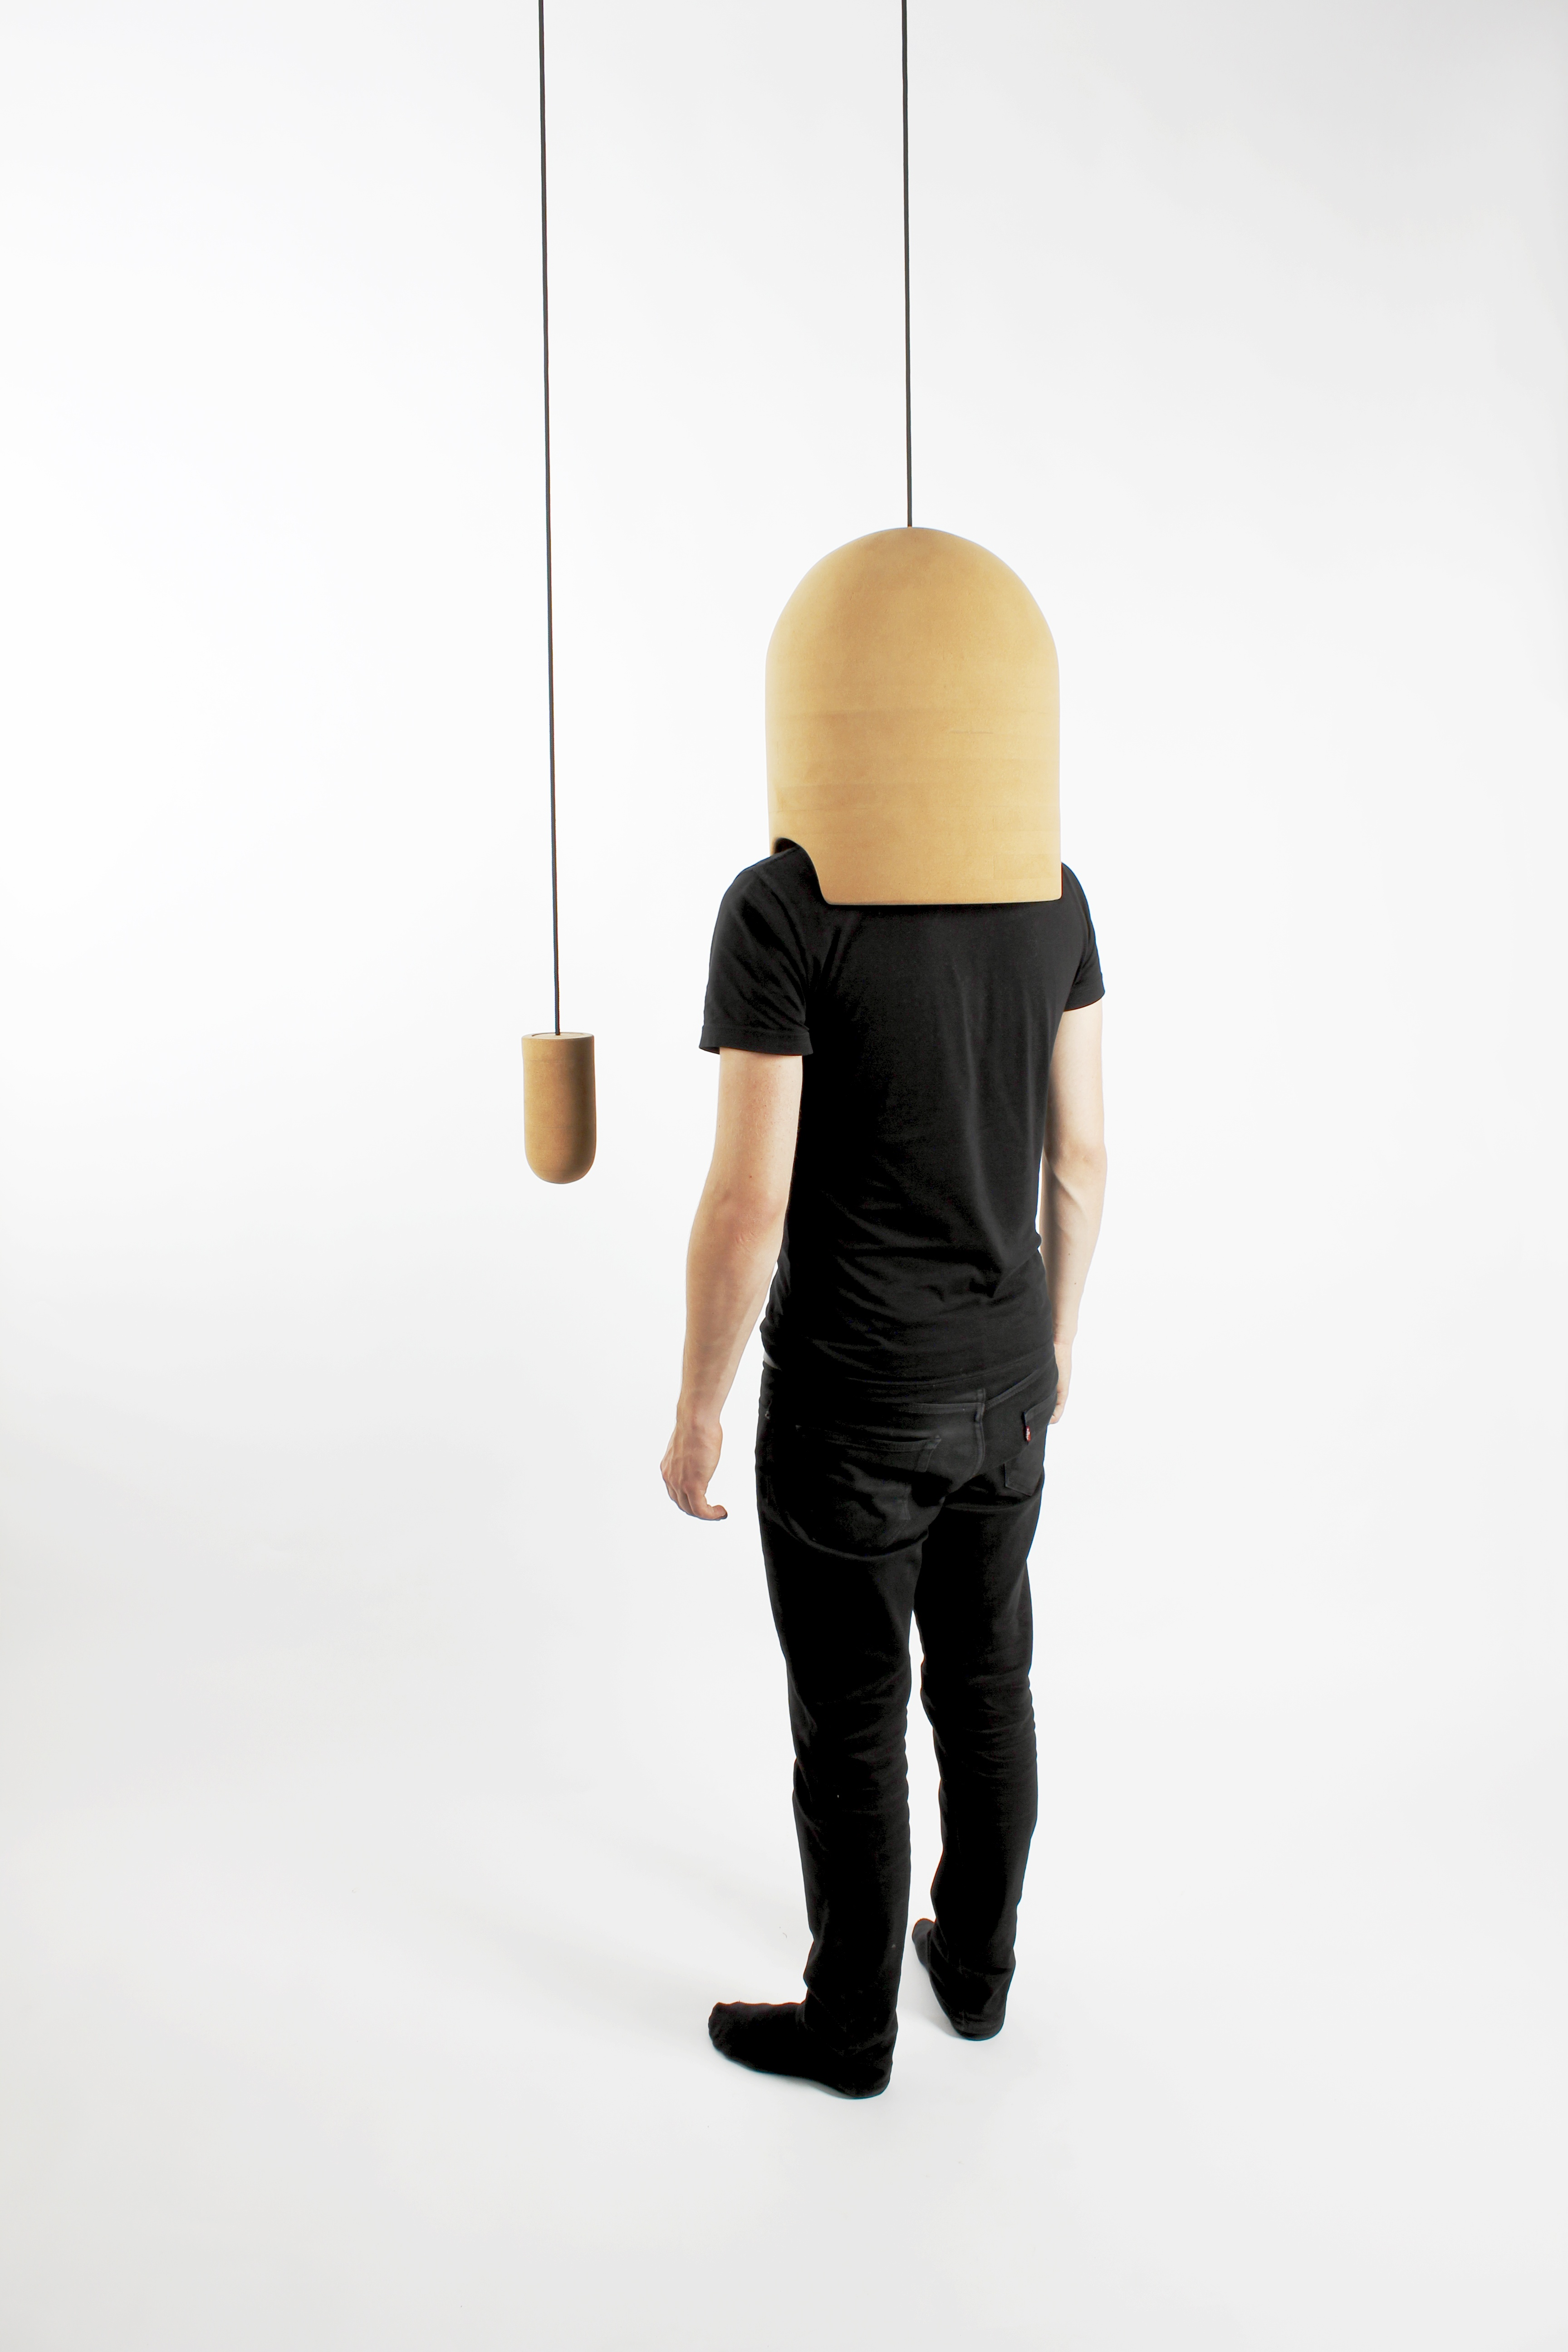 Insulating Cork Helmet - merk: Pierre-Emmanuel Vandeputte